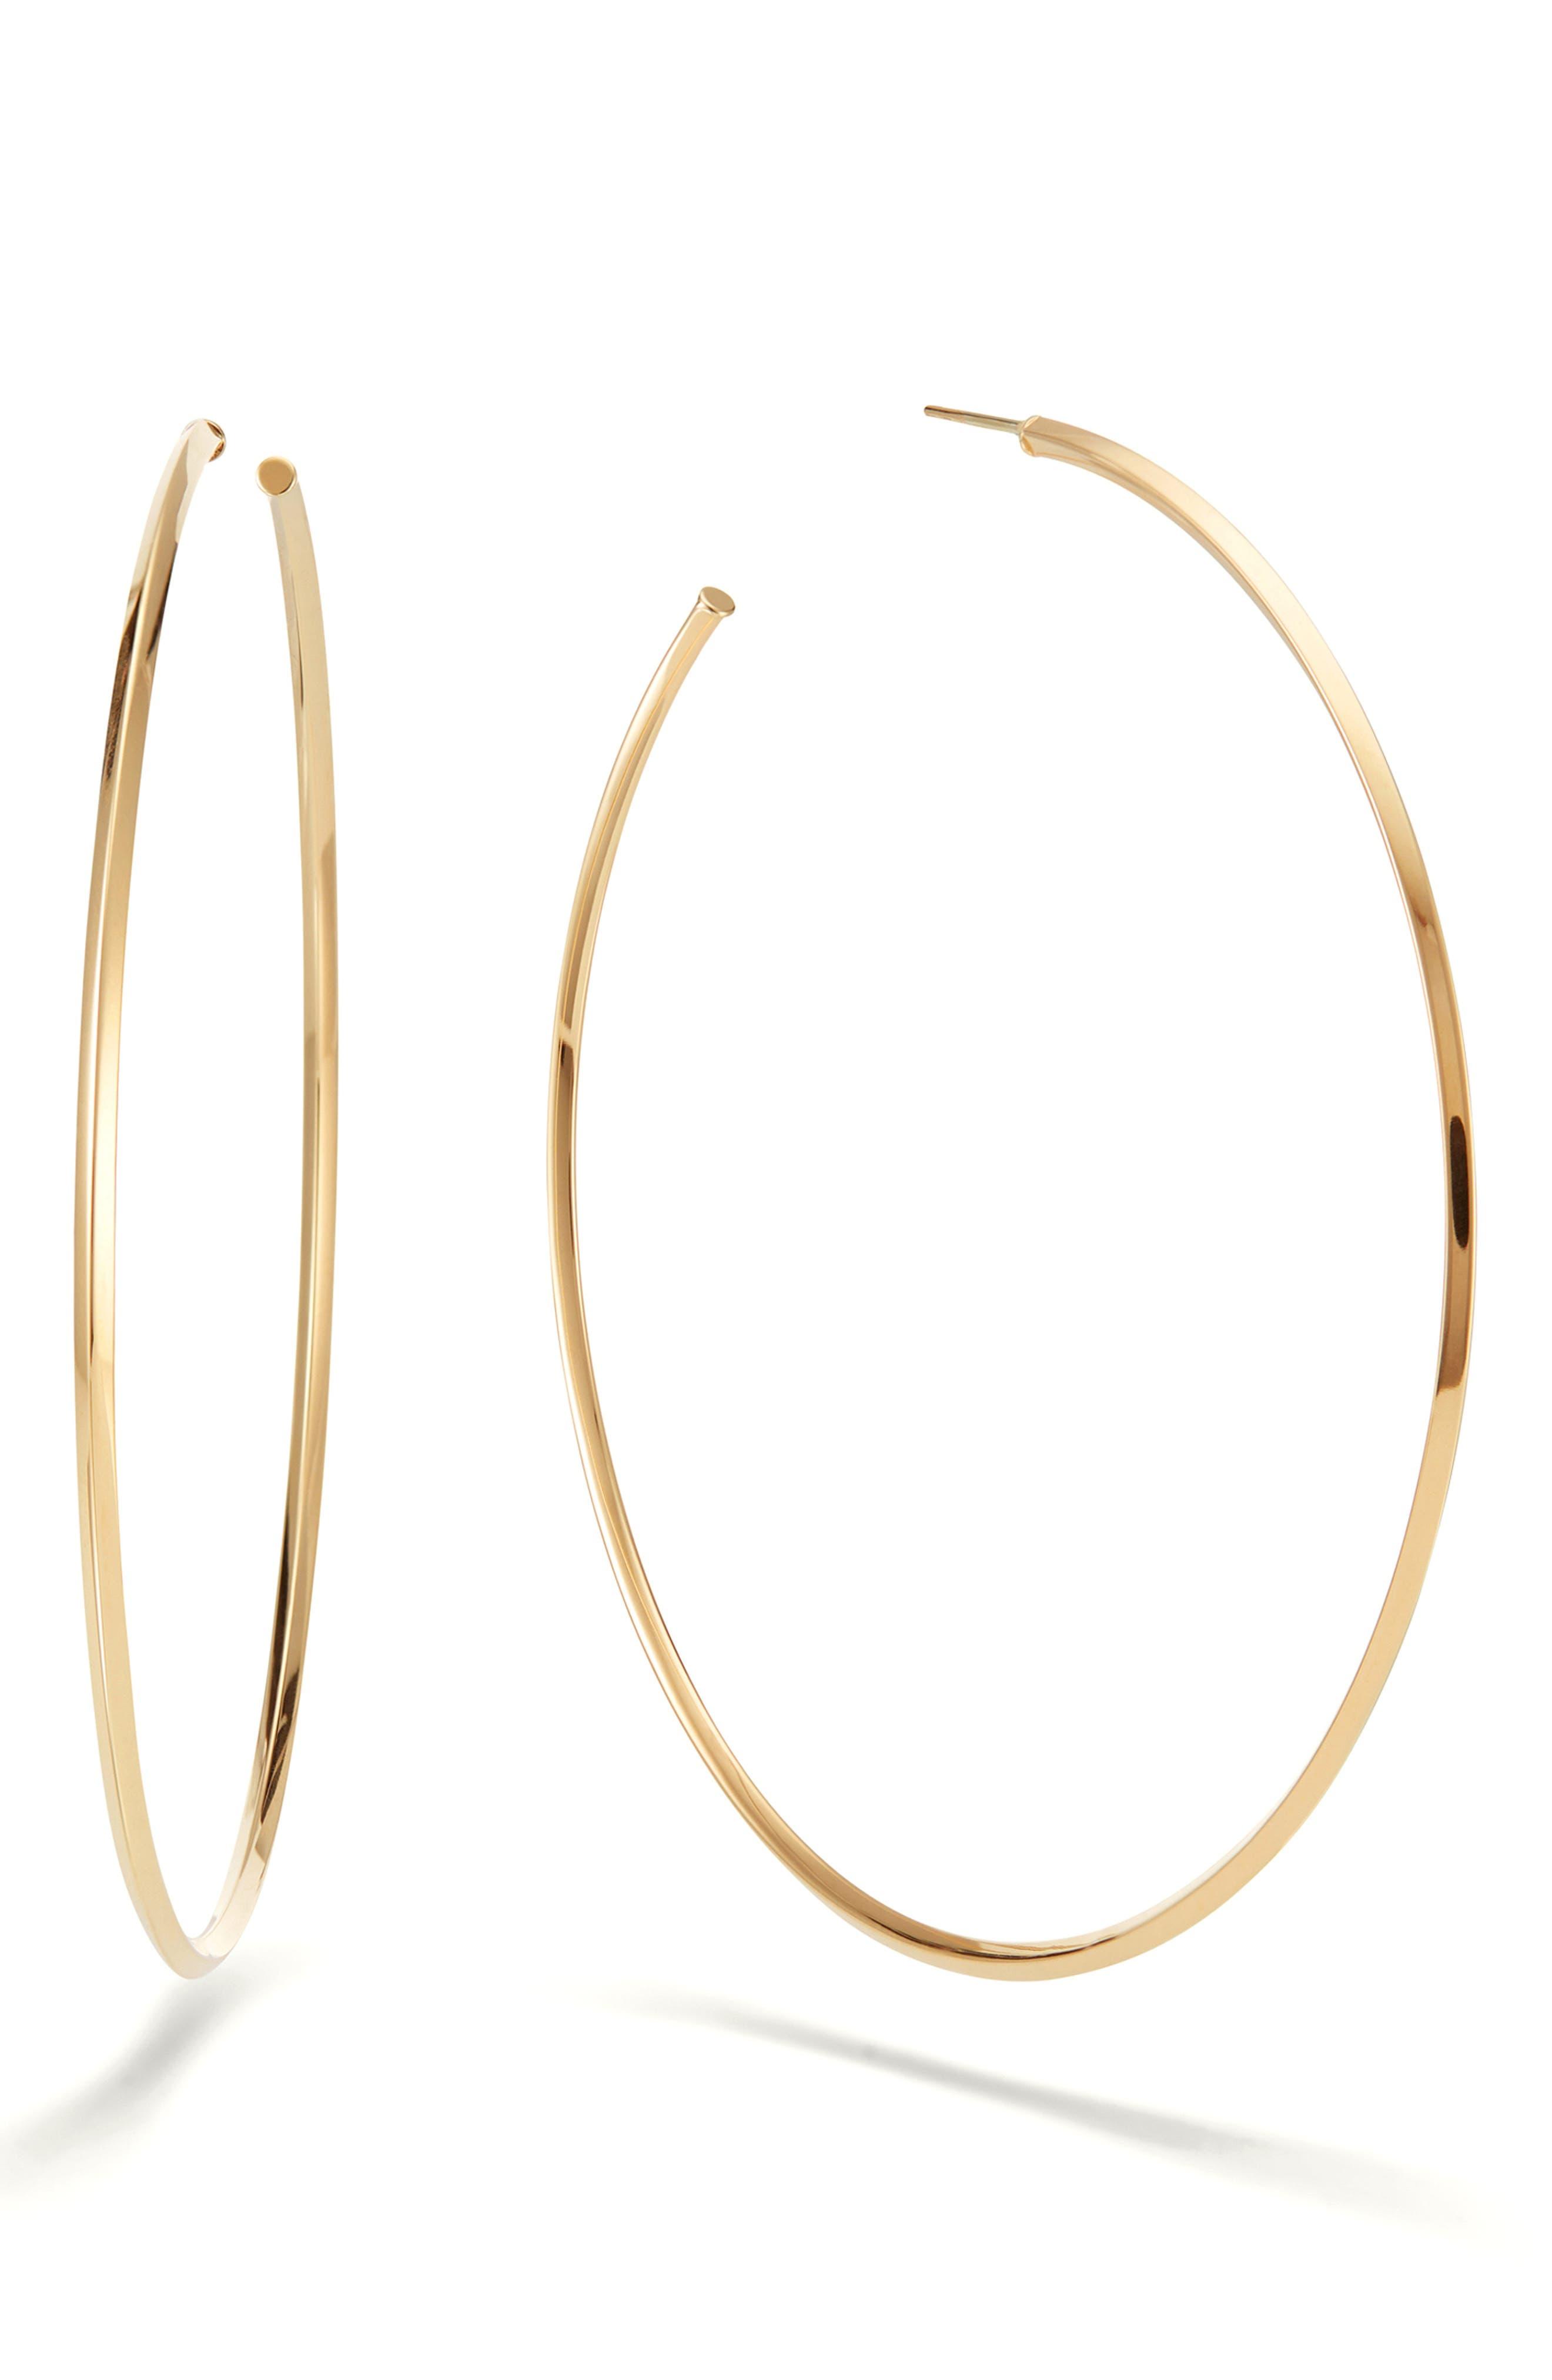 Casino Hollow Hoop Earrings